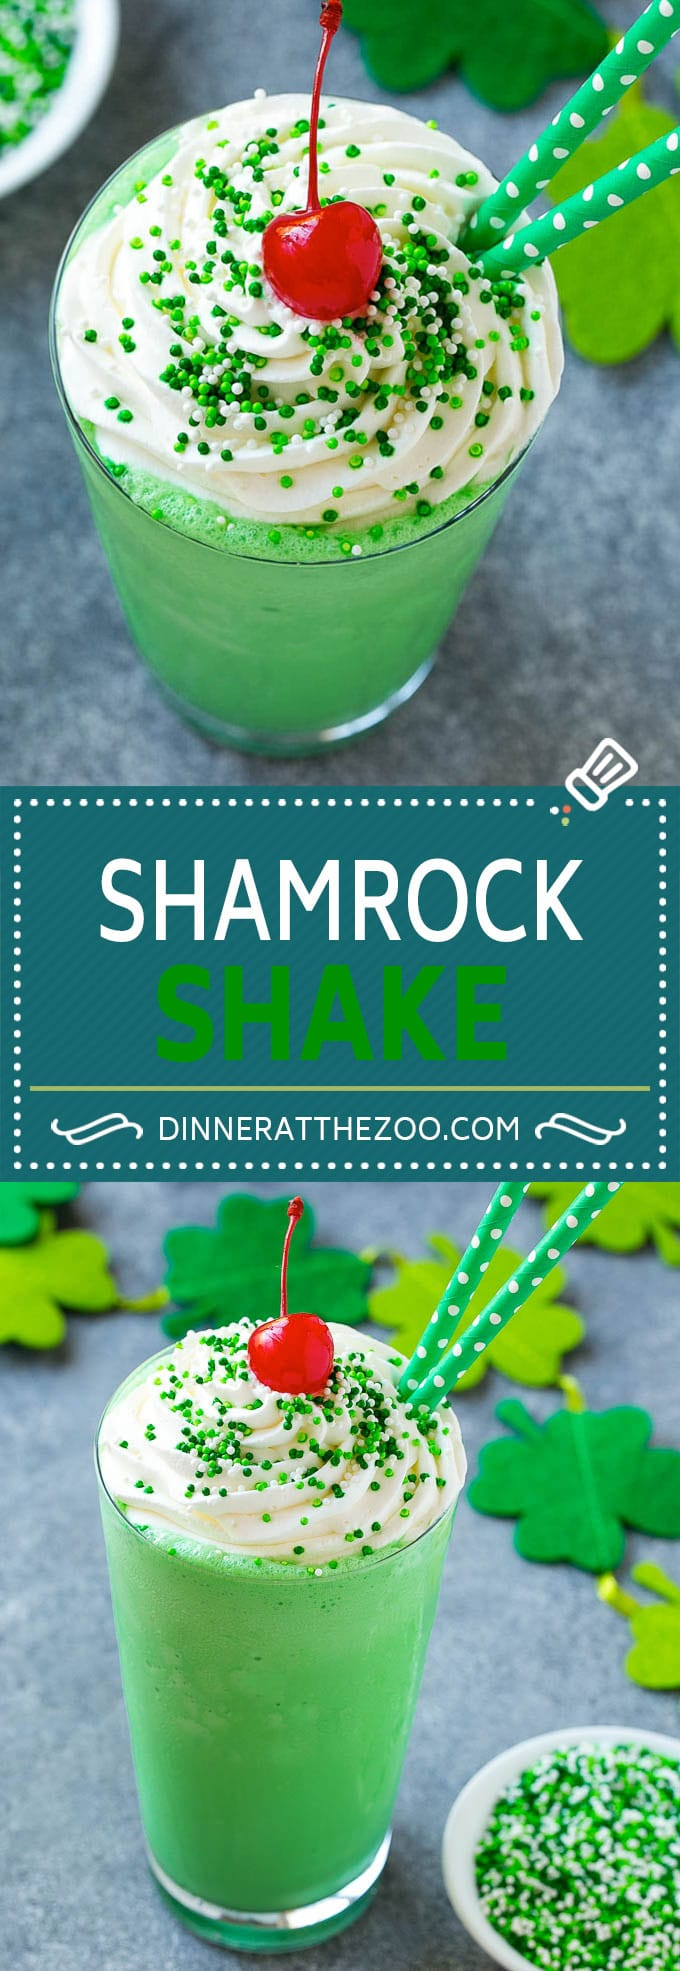 Shamrock Shake Recipe | McDonald's Shamrock Shake | Saint Patrick's Day Drink | Mint Milkshake